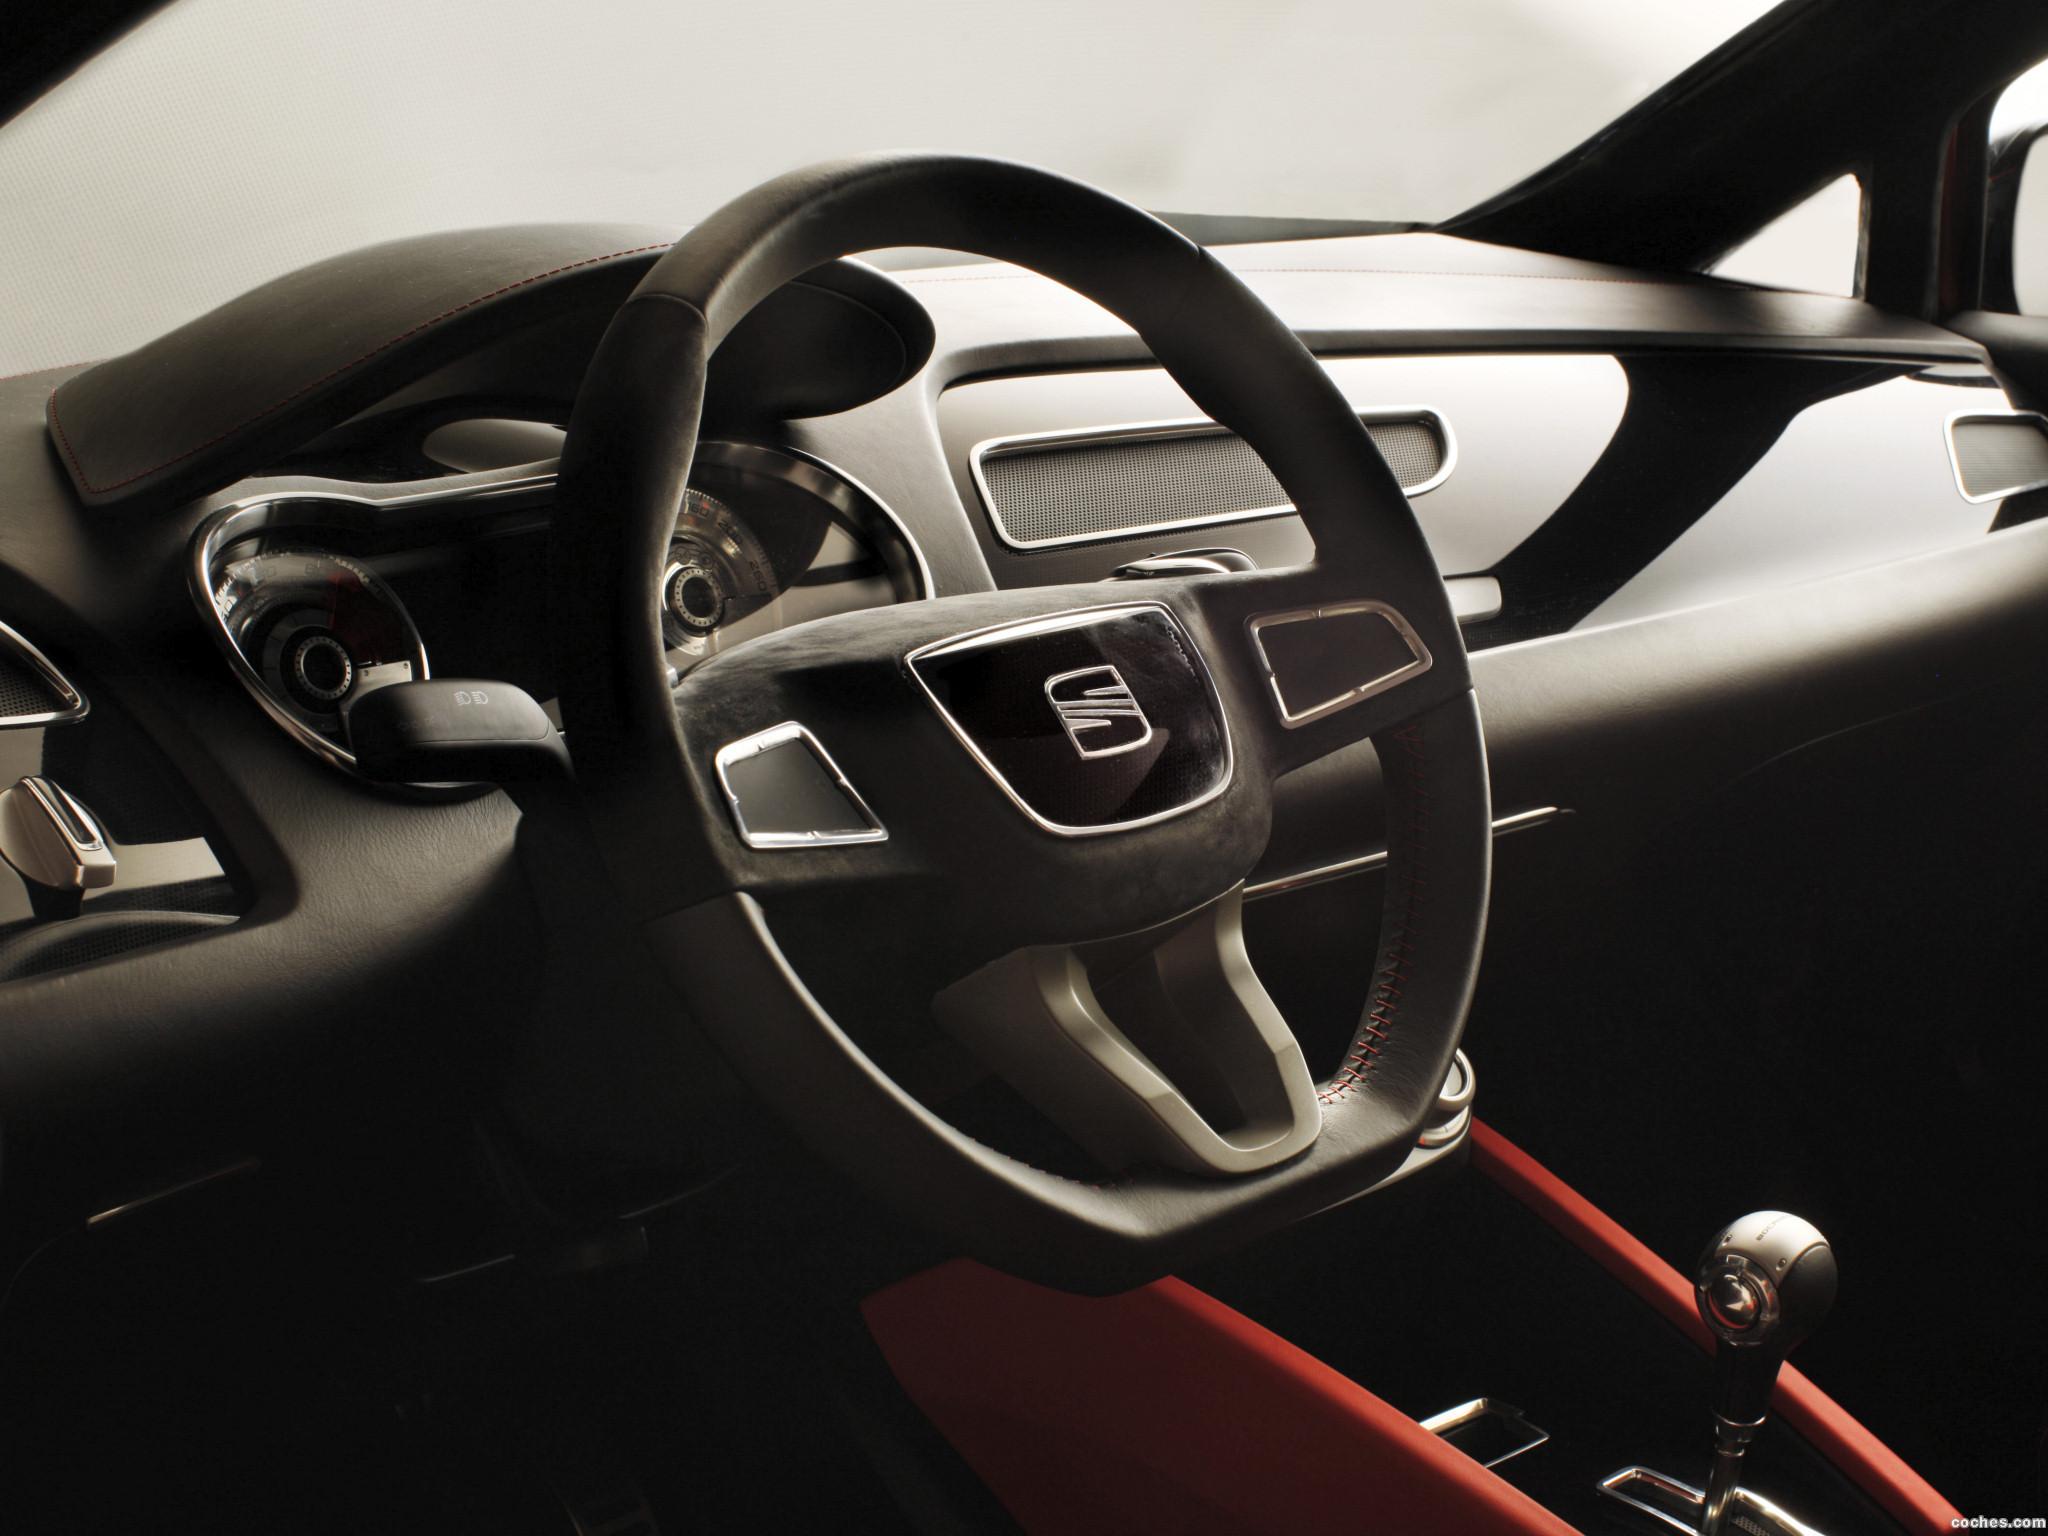 Foto 10 de Seat Ibiza Bocanegra SportCoupe Concept 2008